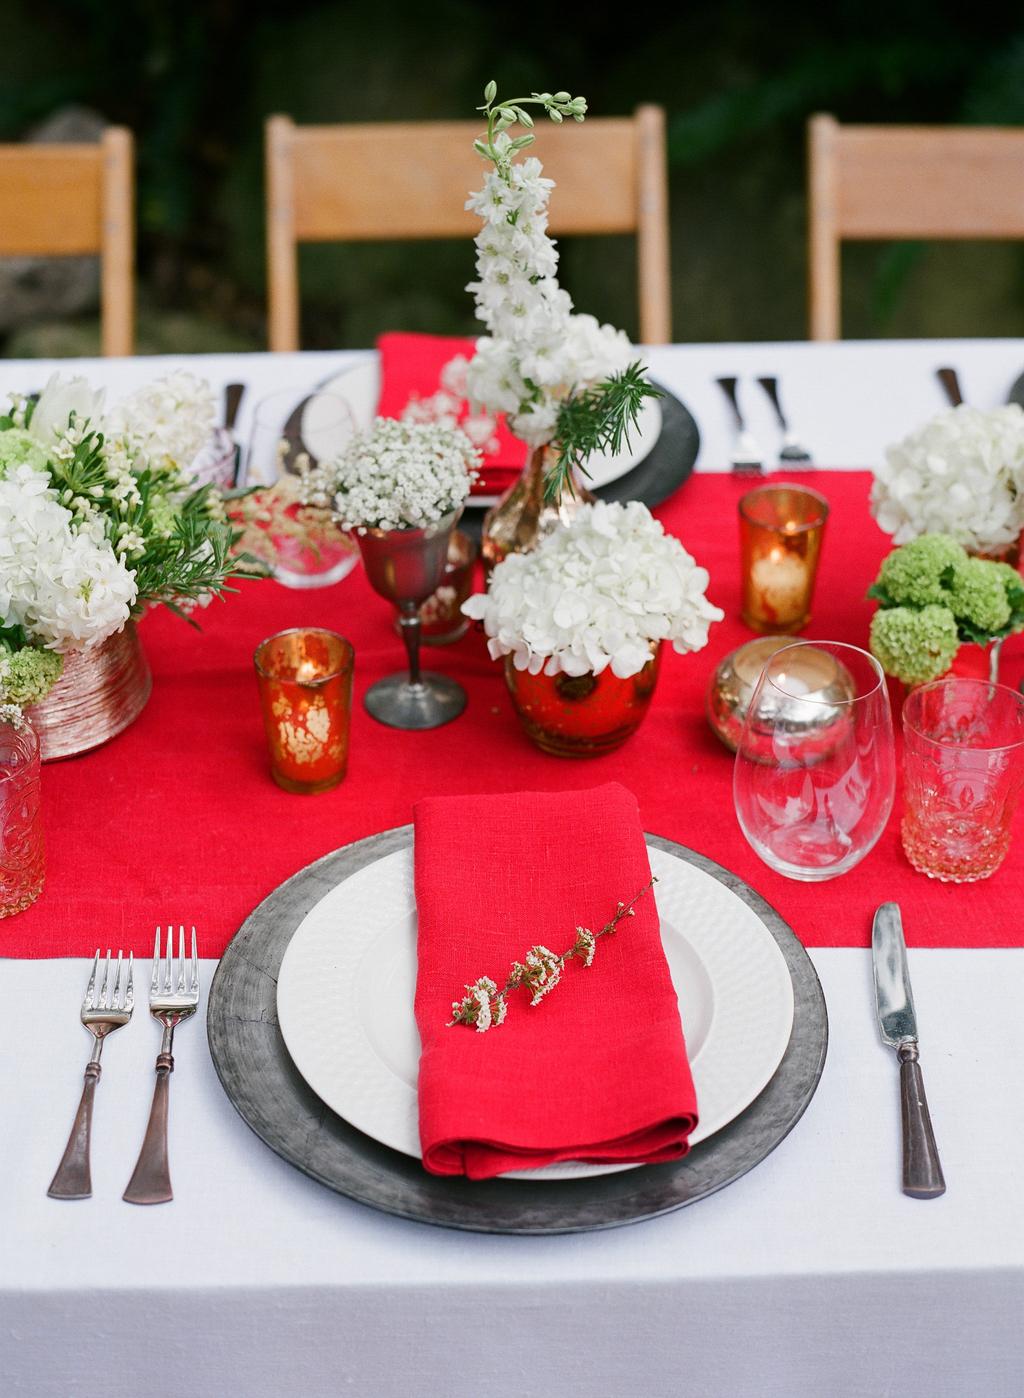 Styled-wedding-santa-barbara-chic-beaux-arts-photographie-italian-bohemian-wedding-venue-table-setting-red-white-flowers-antique-glass-032.full